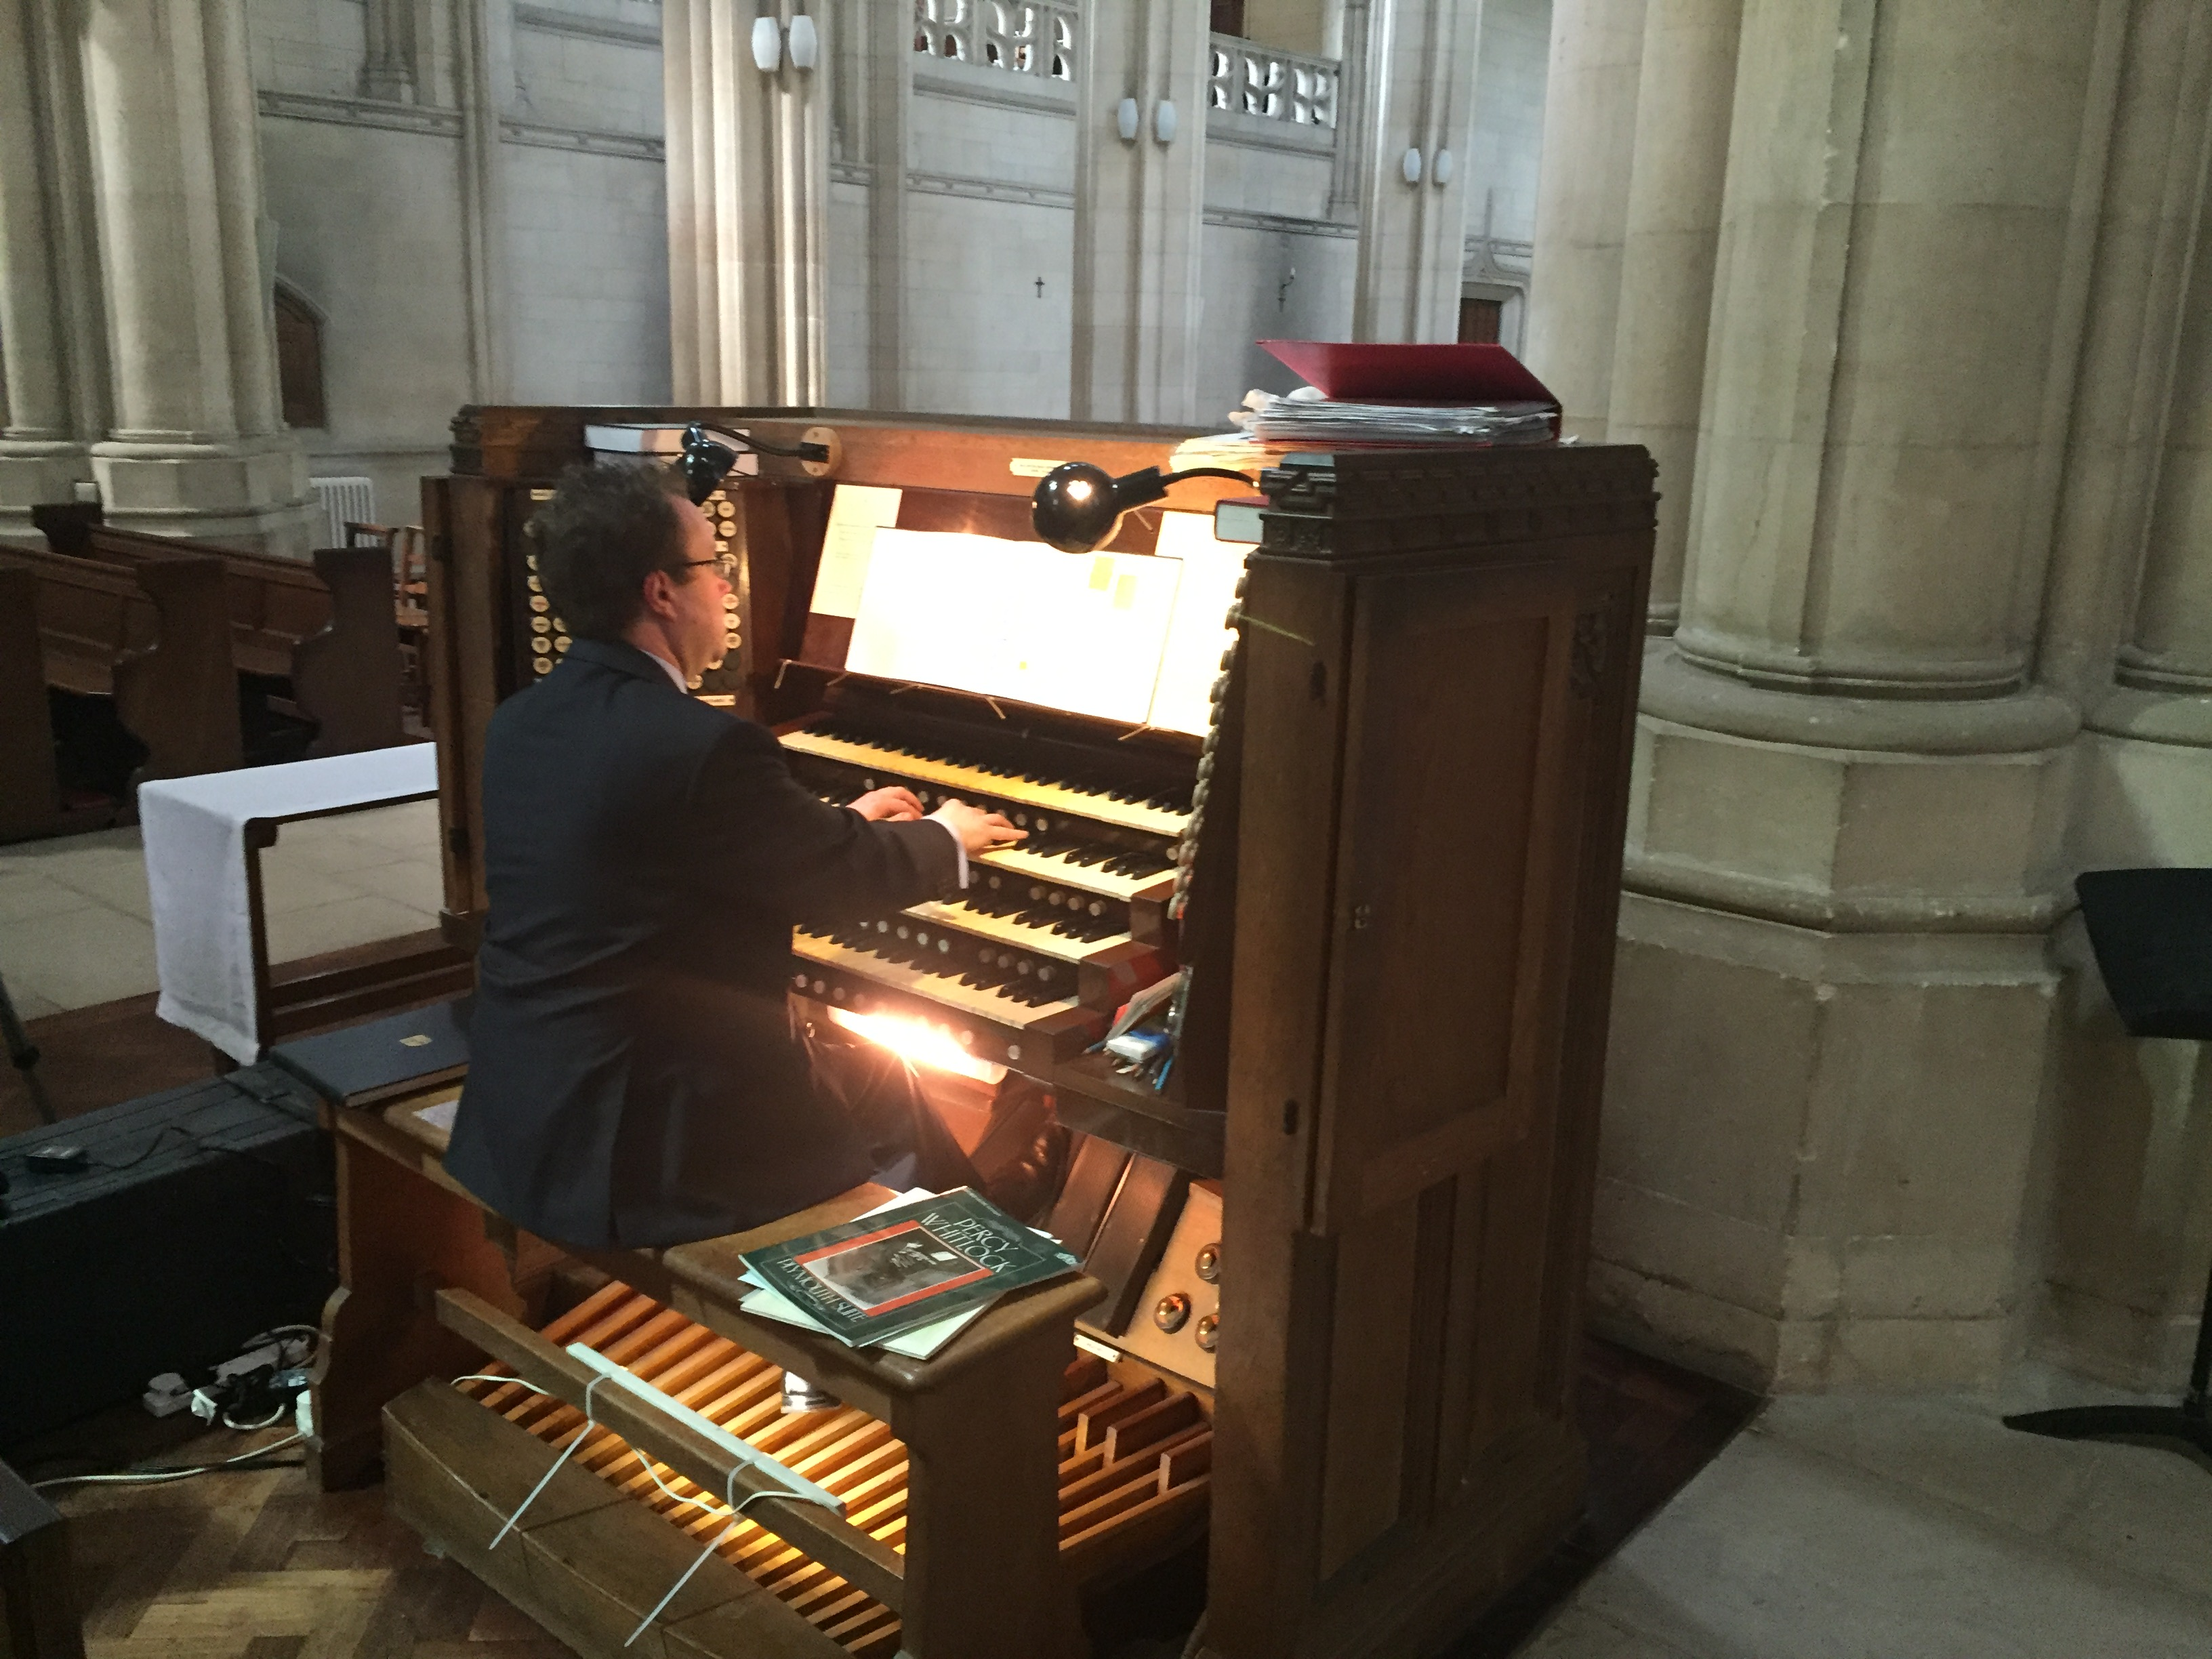 Organists Visit Downside